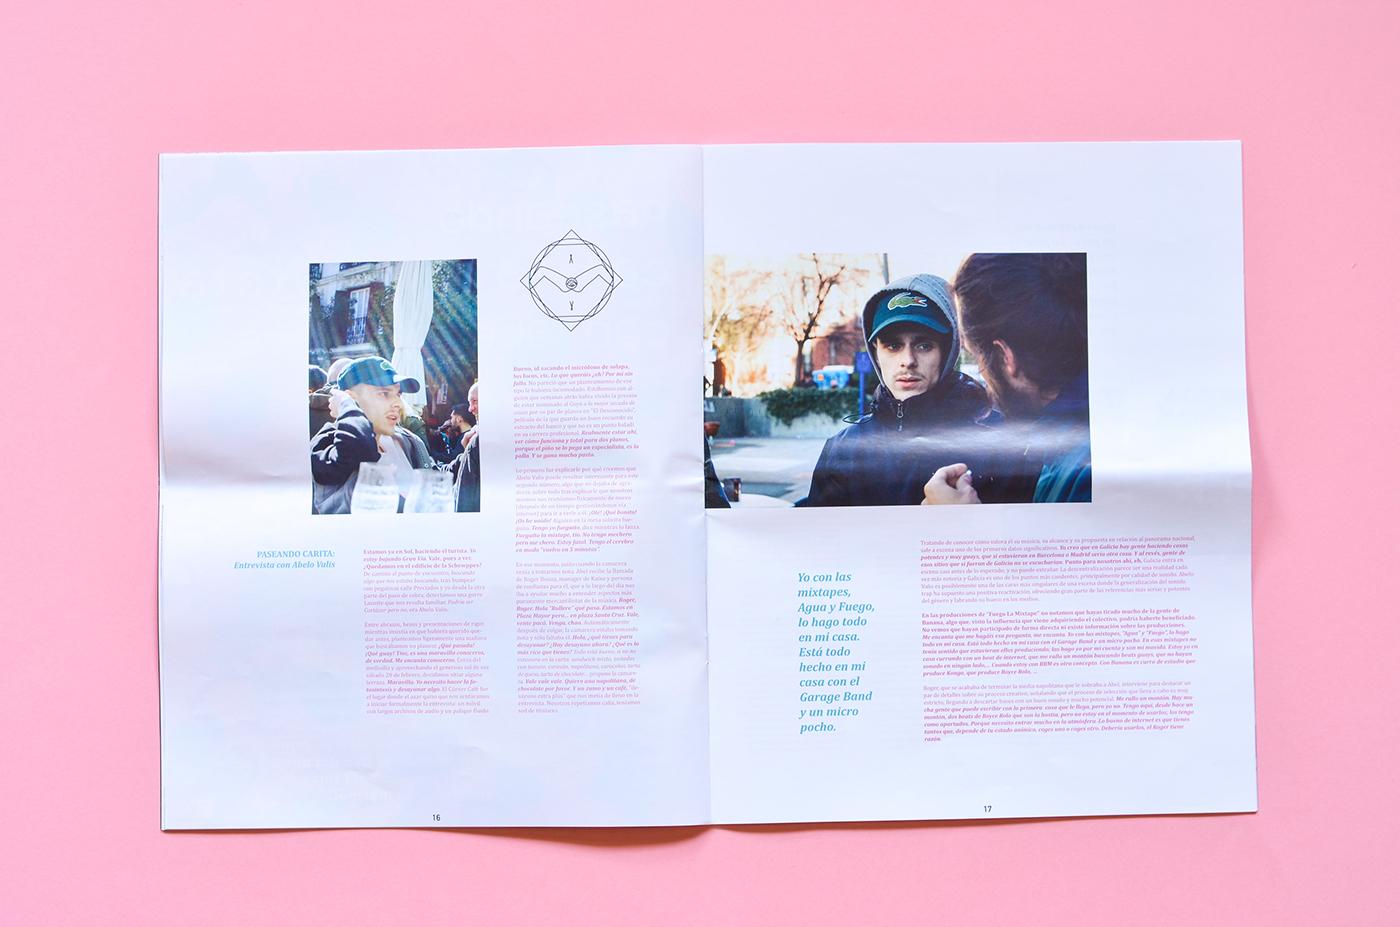 magazine,fanzine,editorial,hip hop,paper,milkshake,pink,rap,music,ILLUSTRATION